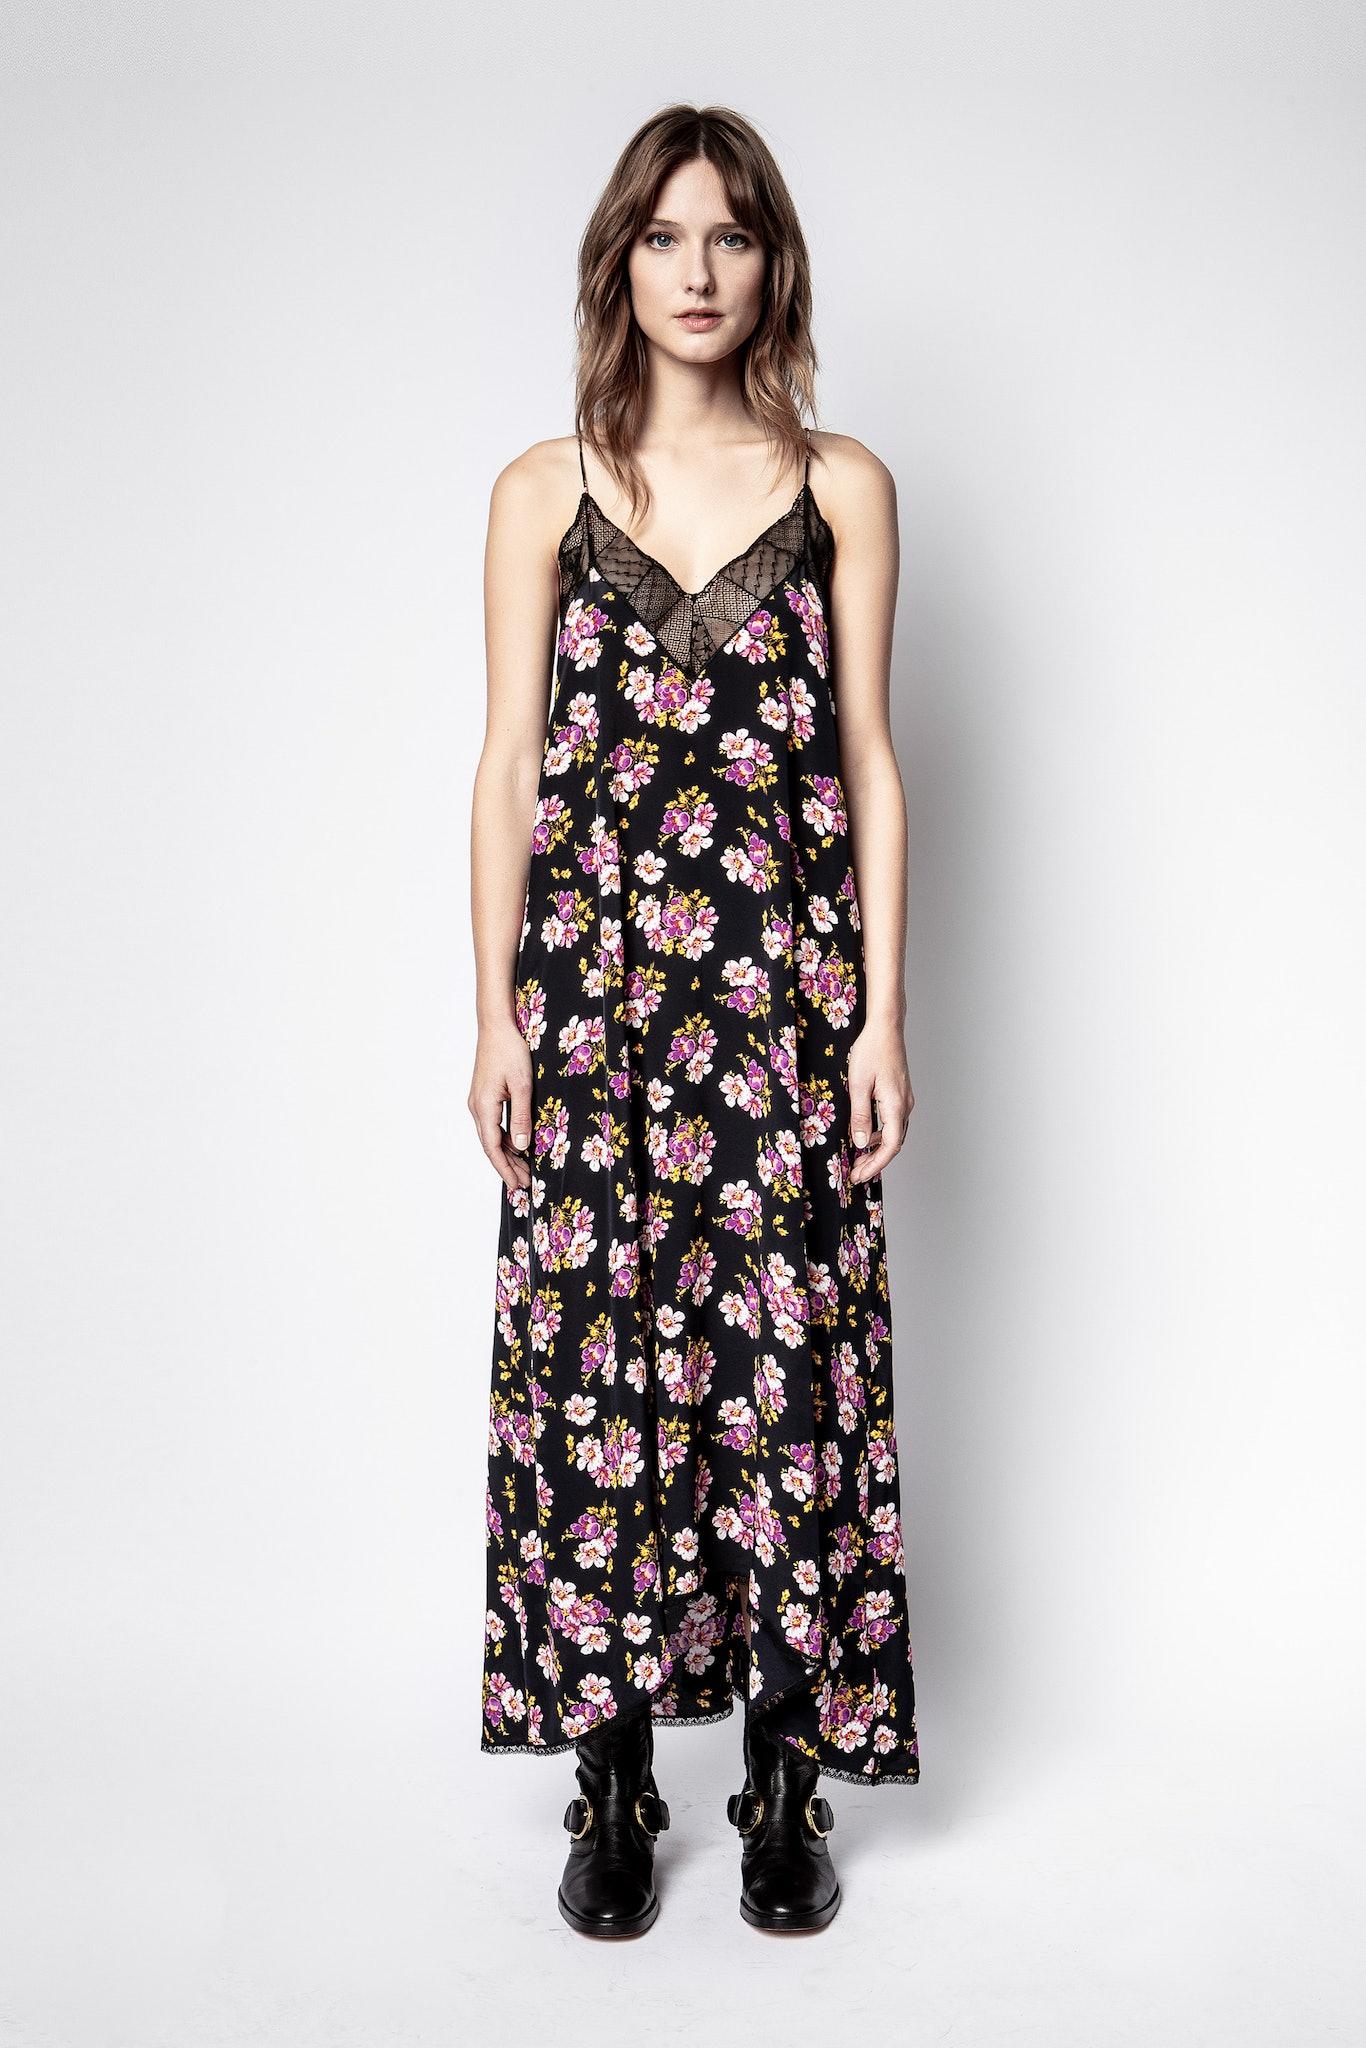 Risty Peonies Dress